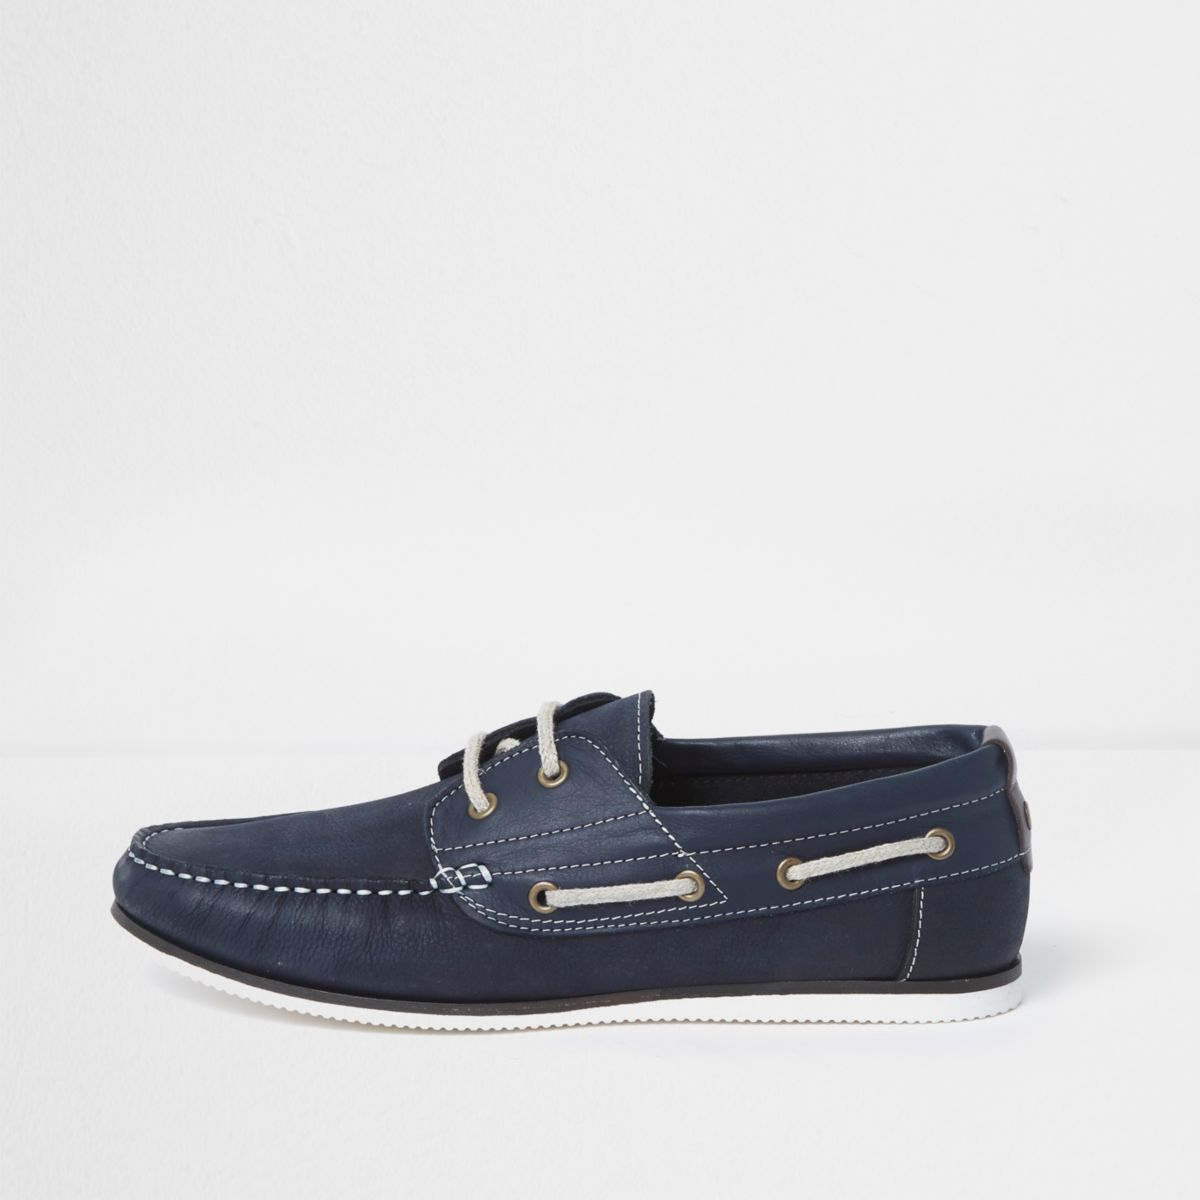 Chaussures Bateau En Cuir Bleu Marine fR072RuMDF